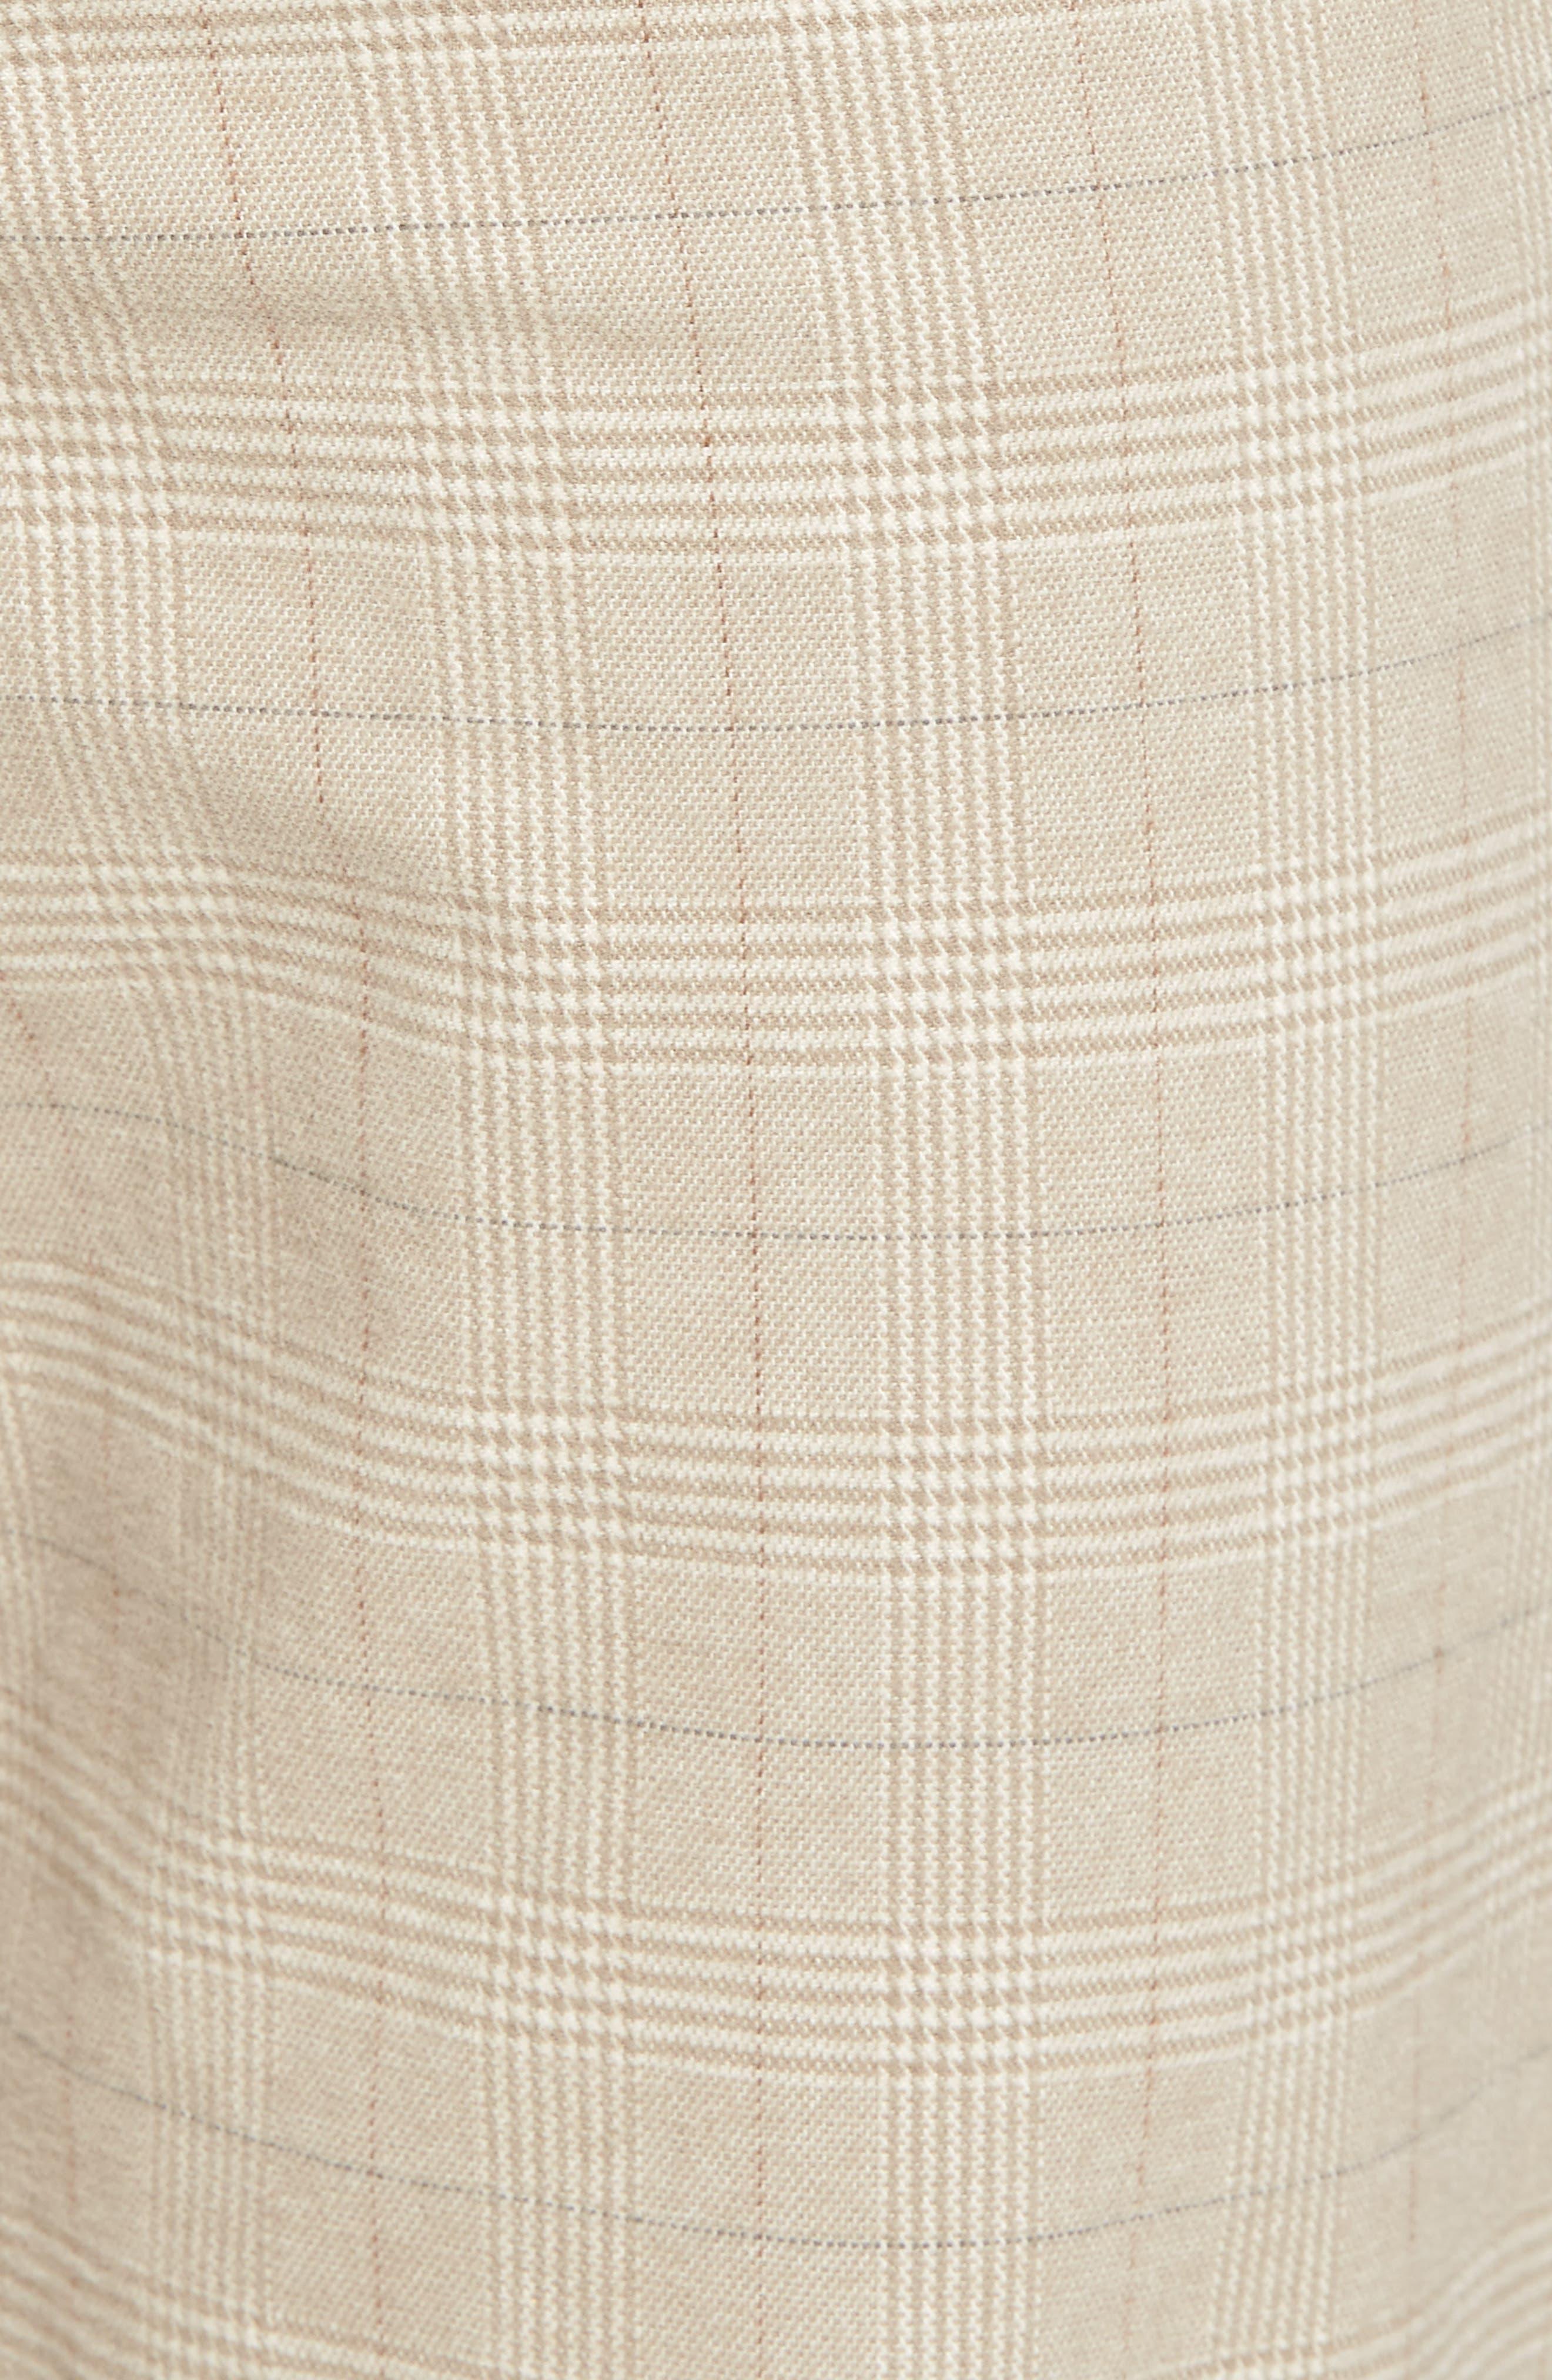 Marshall Slim Fit Pants,                             Alternate thumbnail 5, color,                             Silica Sand